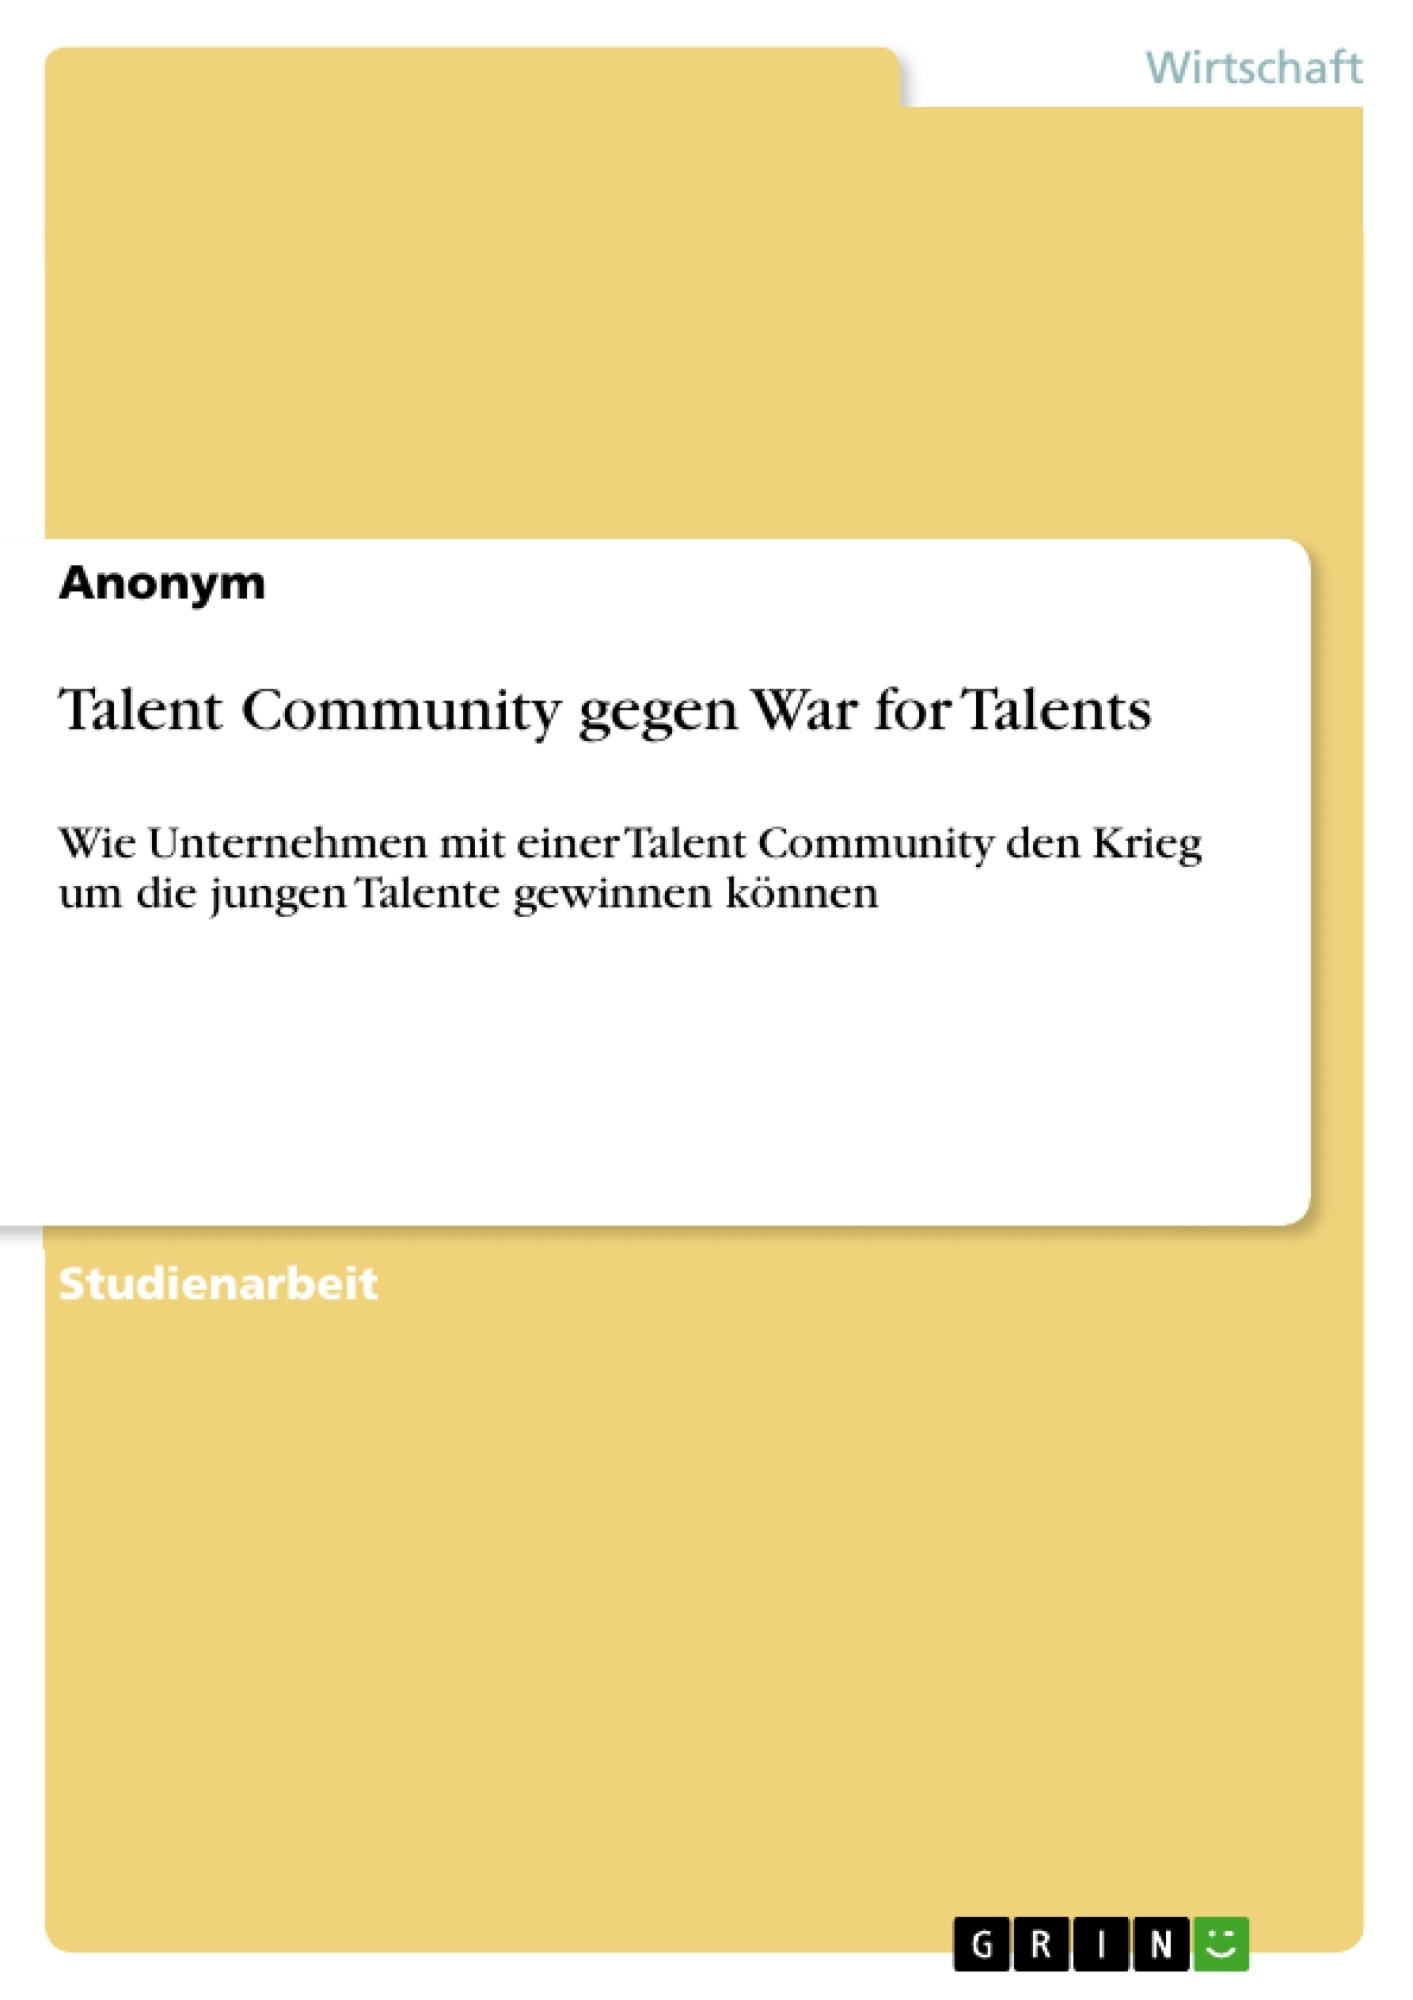 Titel: Talent Community gegen War for Talents